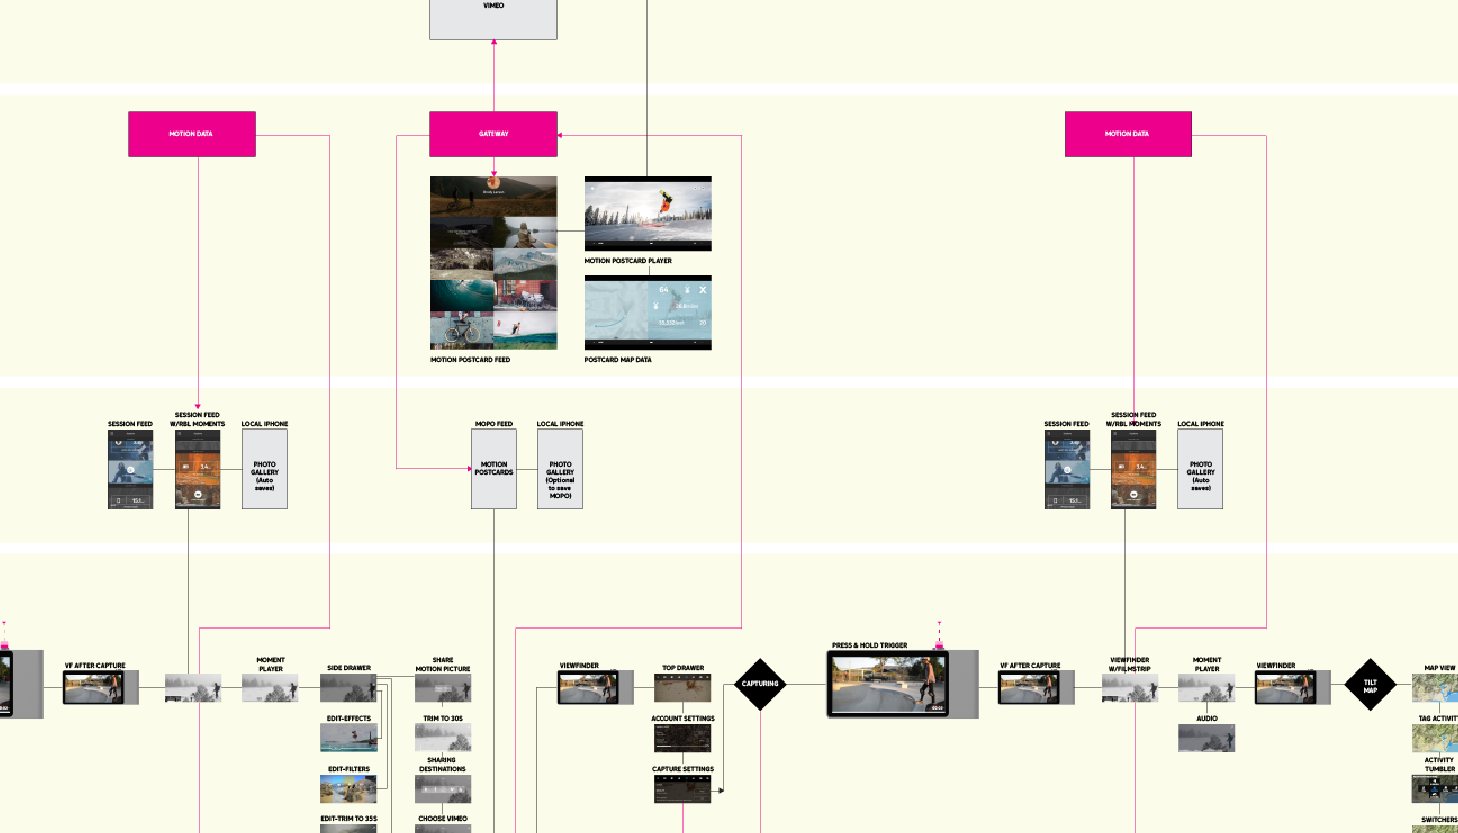 rbl_system_diagram-01.png